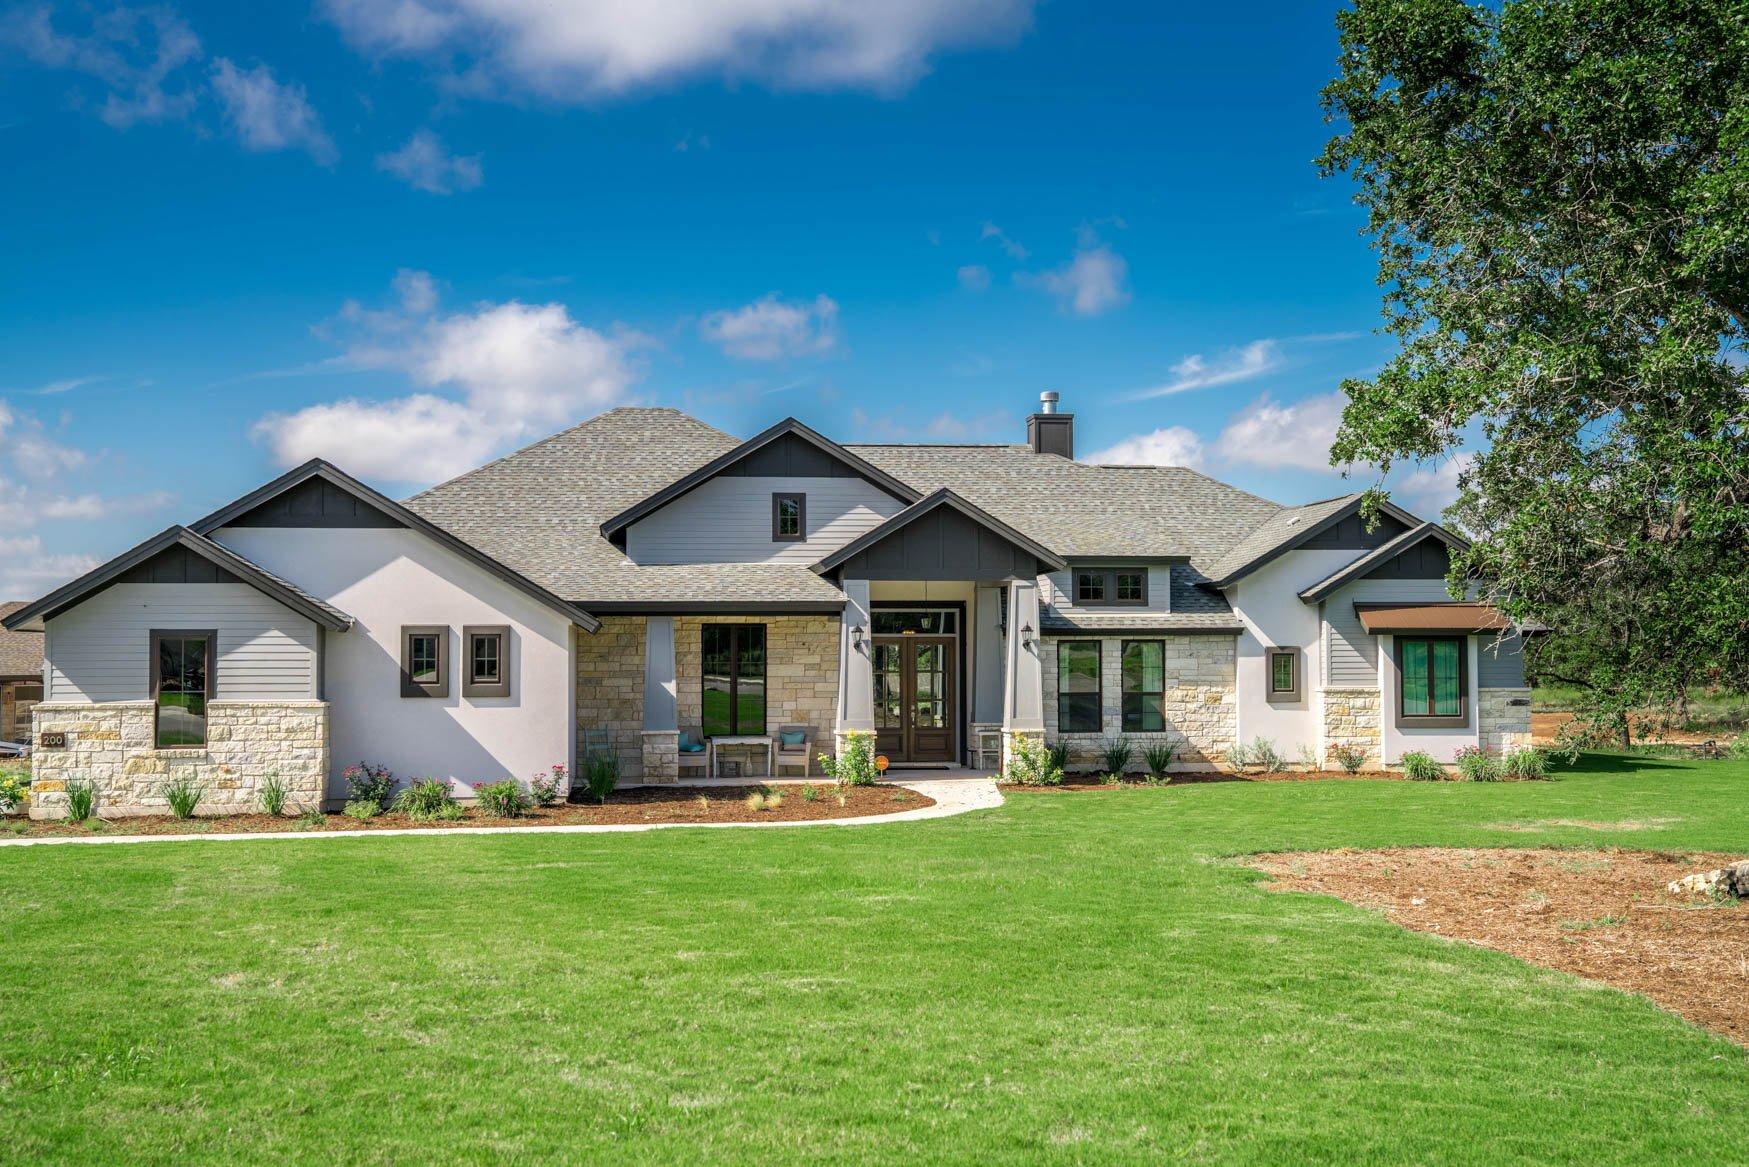 Grand Endeavor Homes